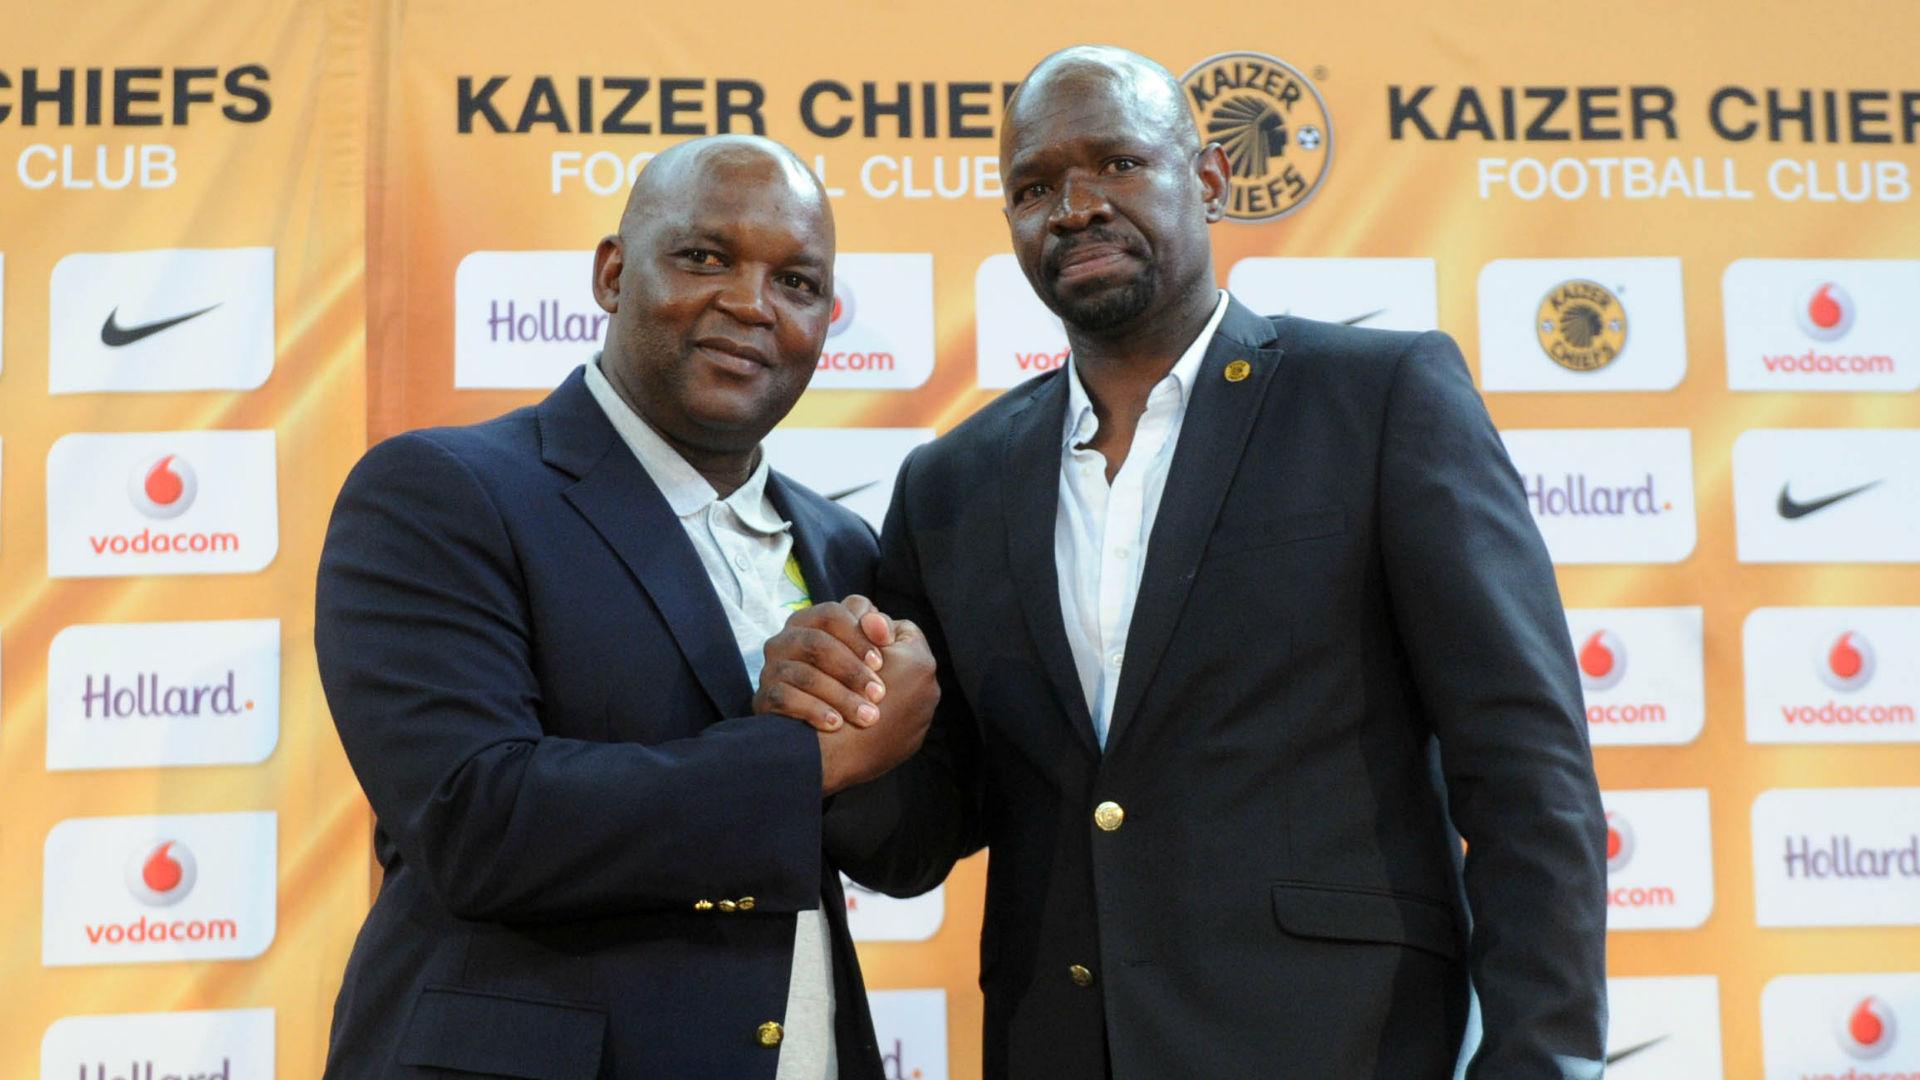 Komphela believes money has influenced Mamelodi Sundowns' transfer business